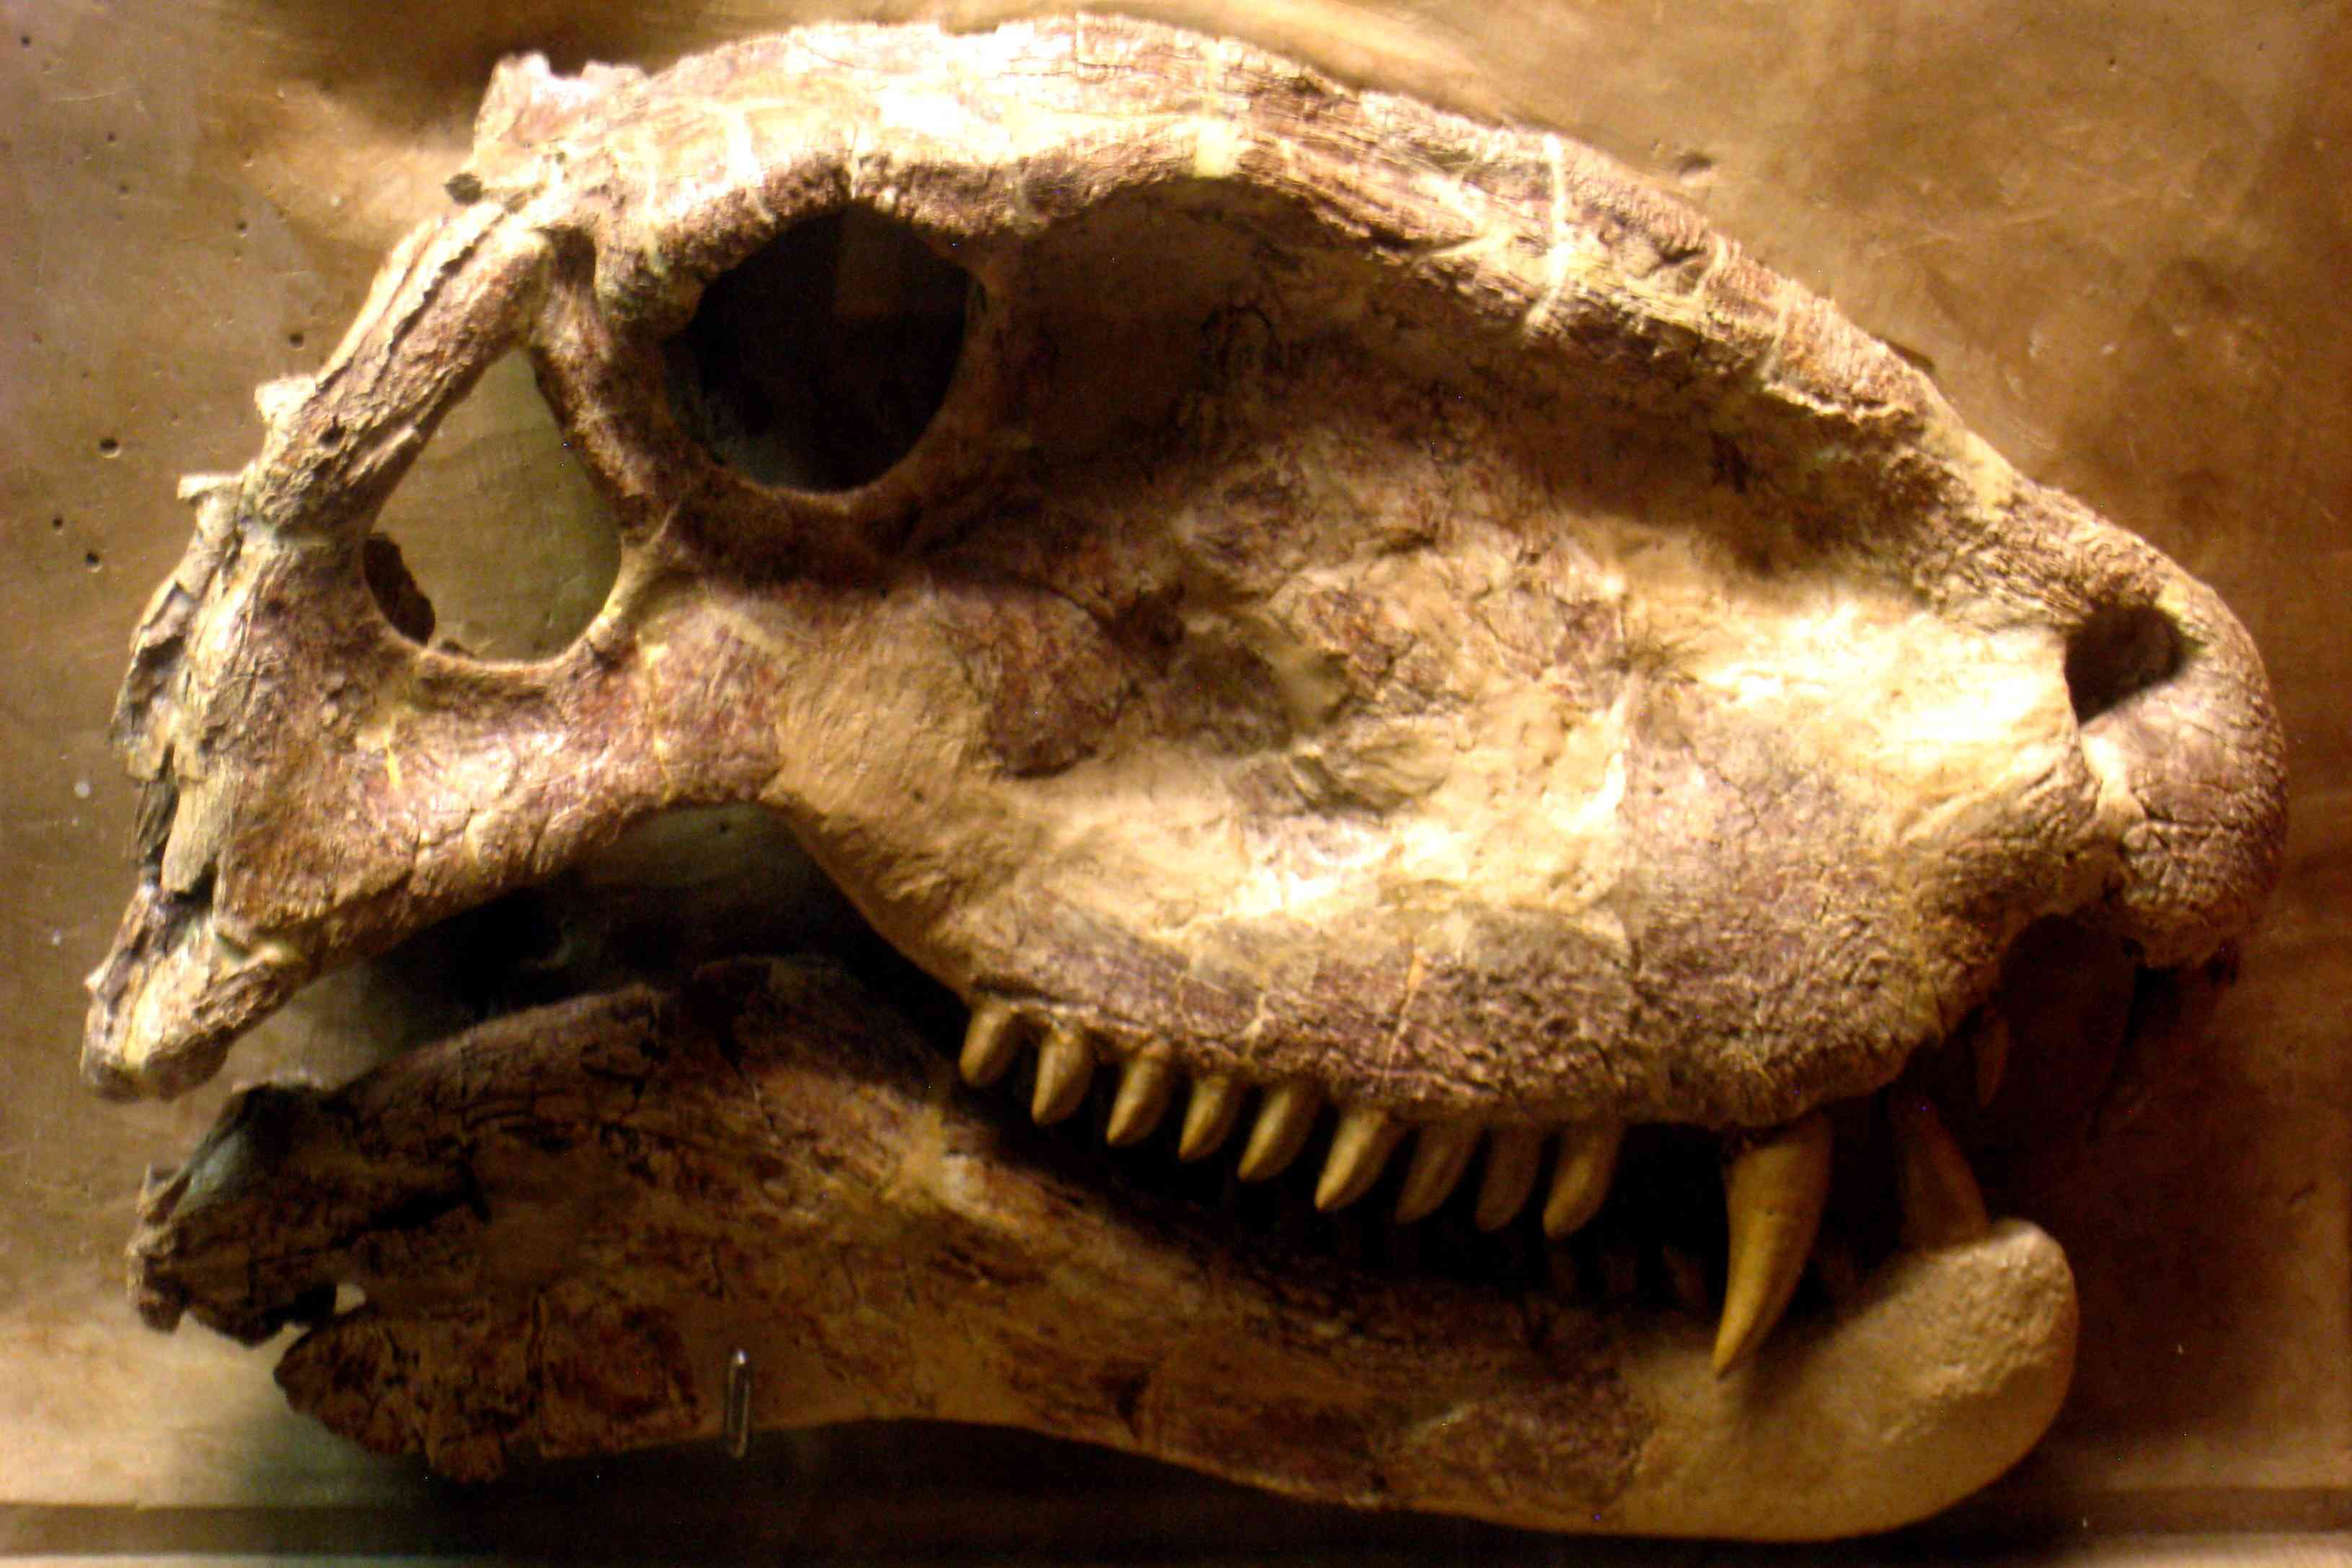 Dimetrodon's skull in profile at the Museum of Natural History, University of Michigan